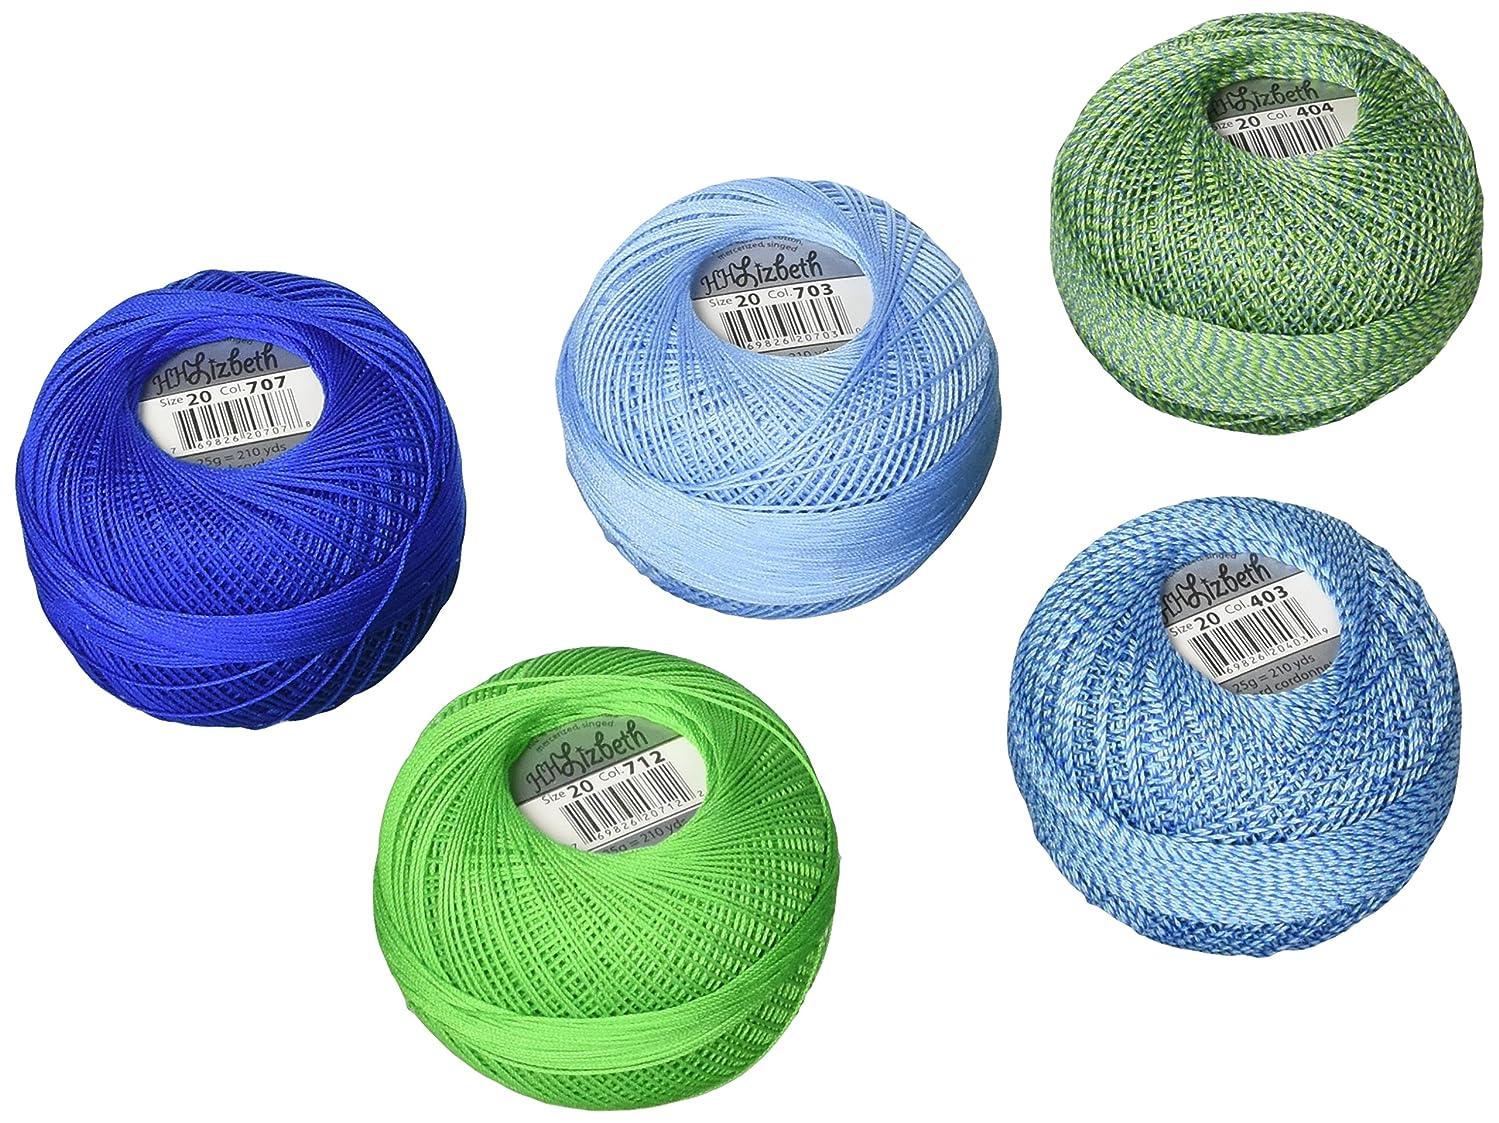 Handy Hands DPN-7221 Lizbeth Specialty Pack Cordonnet Cotton (5 Pack), Size 20, Lagoon Mix, Multicolor